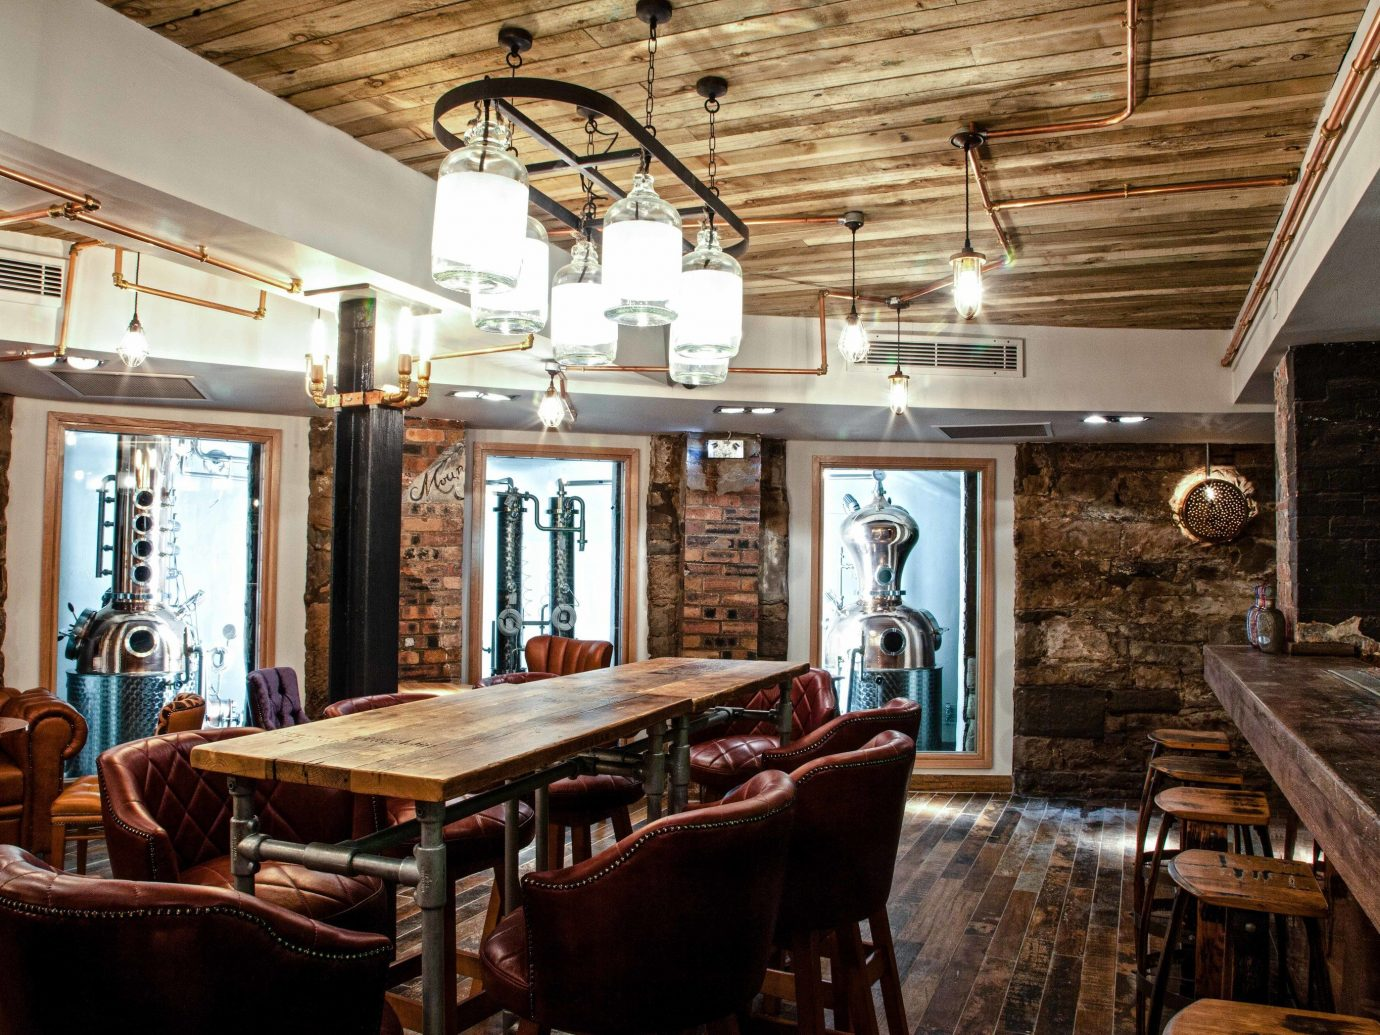 Edinburgh Hotels Jetsetter Guides Scotland Travel Tips Trip Ideas indoor table ceiling floor interior design room wood real estate furniture area